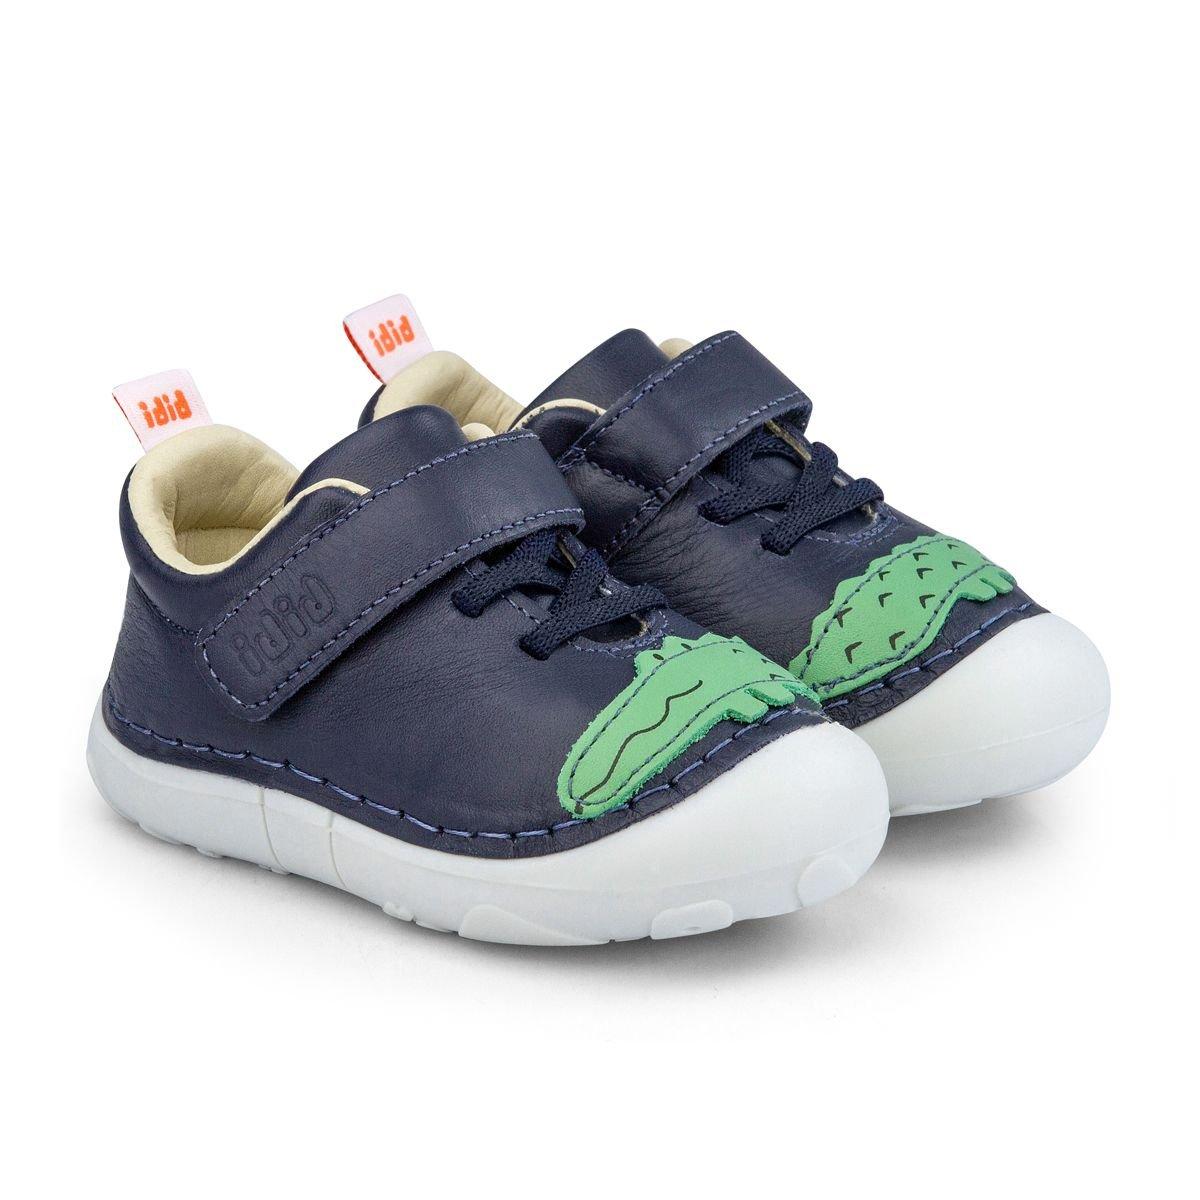 Pantofi sport Bibi Shoes Grow Crocodil imagine